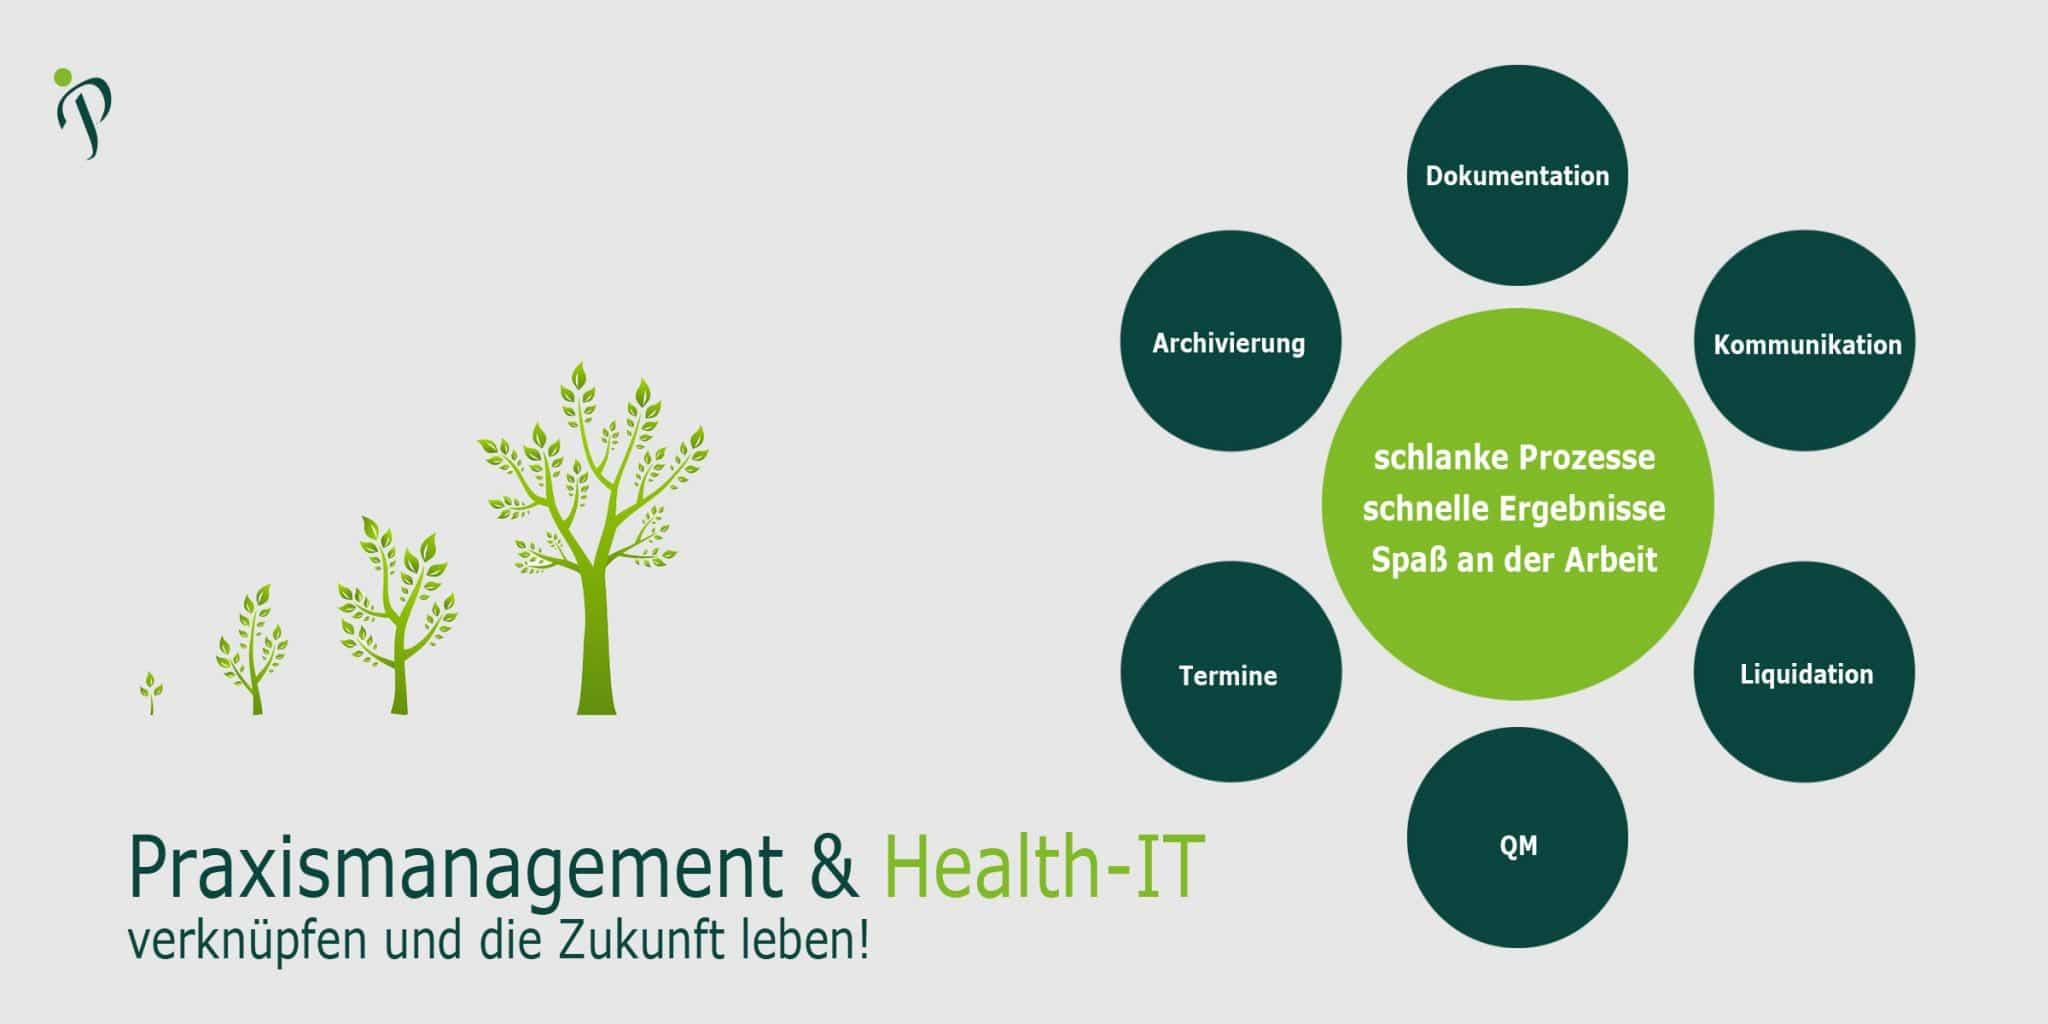 praxismanagement-health-it